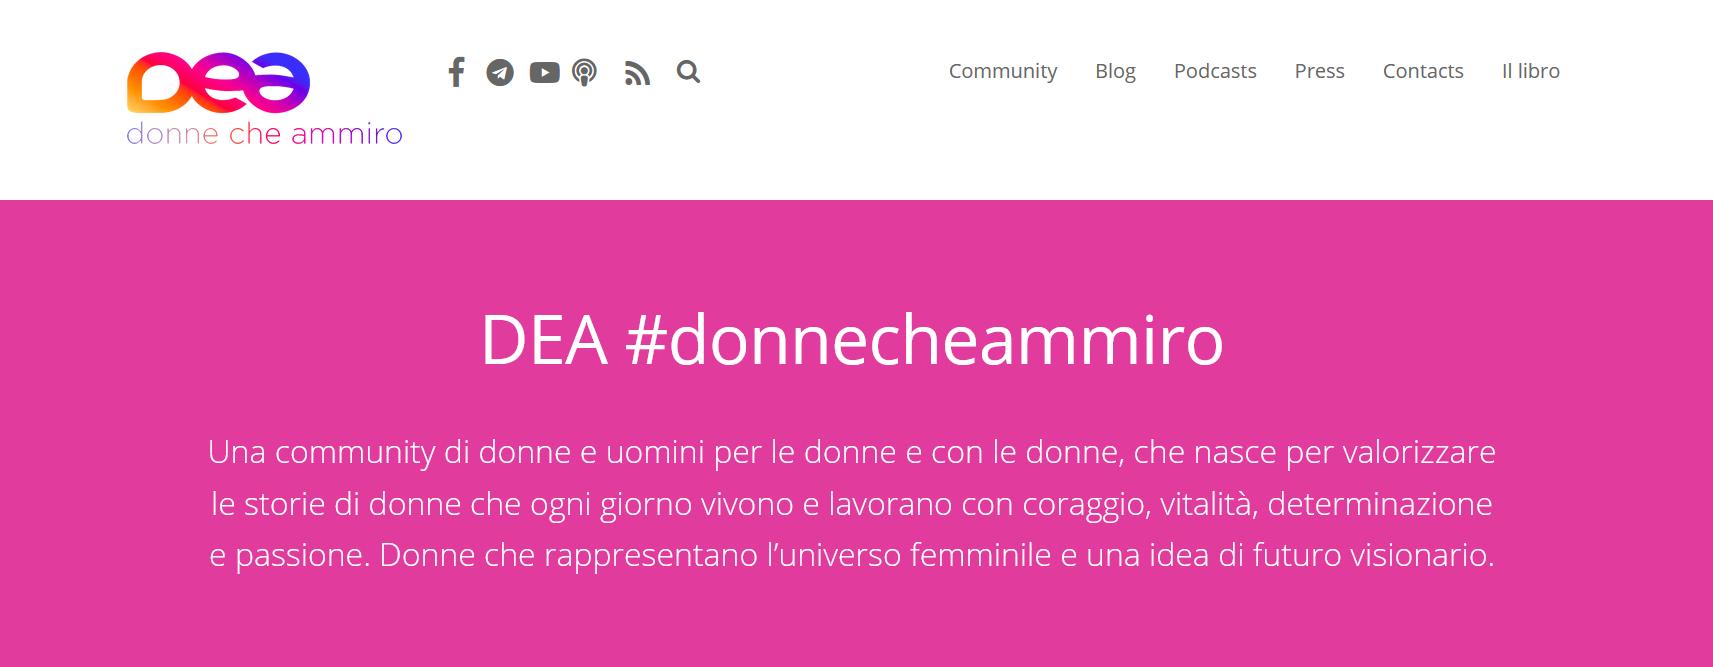 Un anno con Dea, intervista a Mariangela Cassano